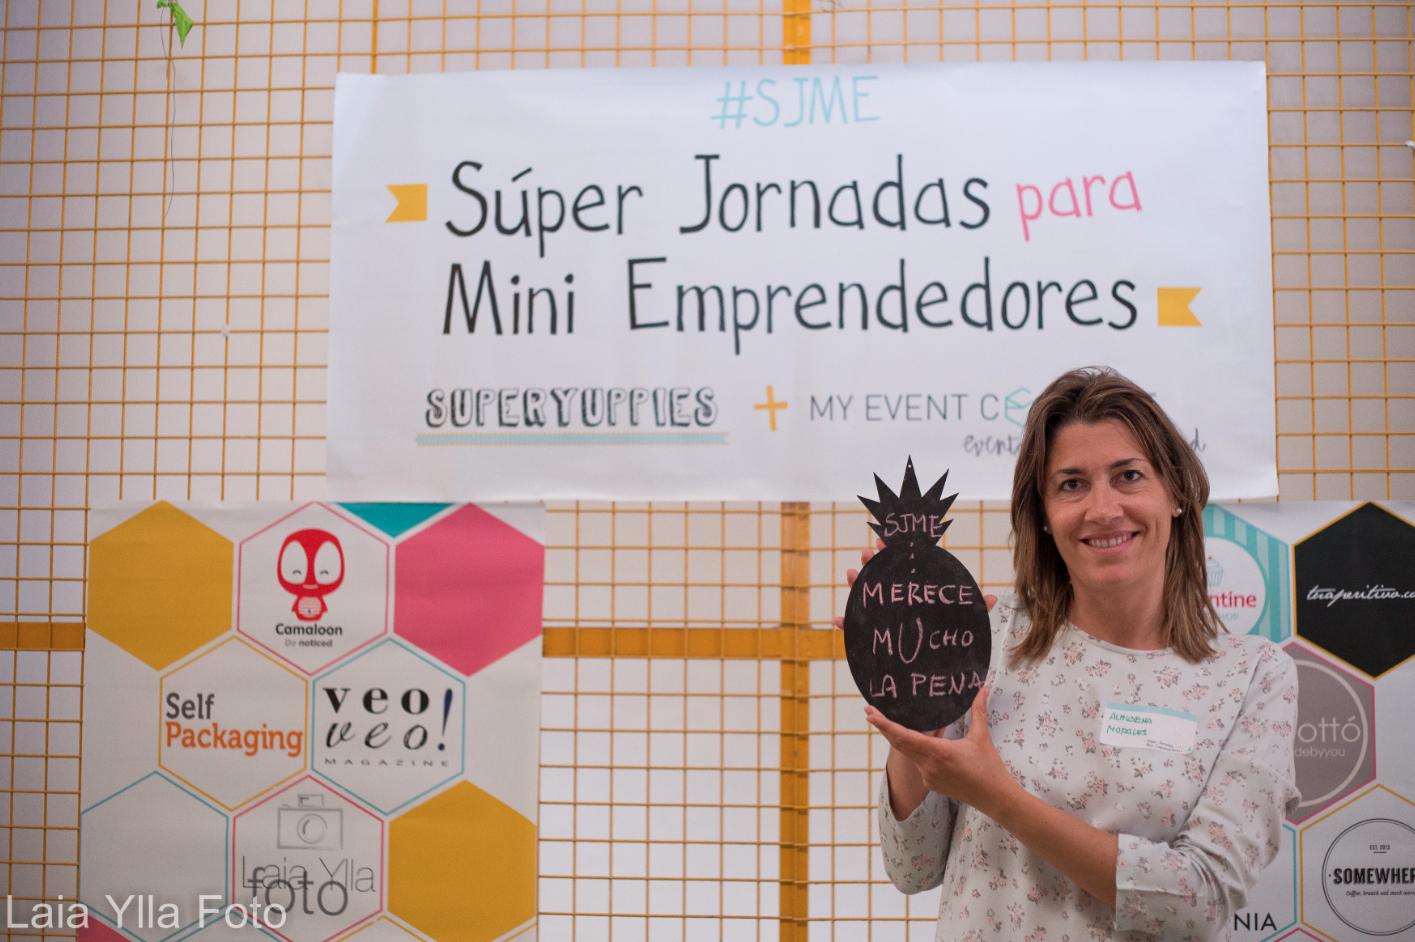 mrwonderful_super_jornadas_mini_emprendedores_superyuppies_my_event_concept_01